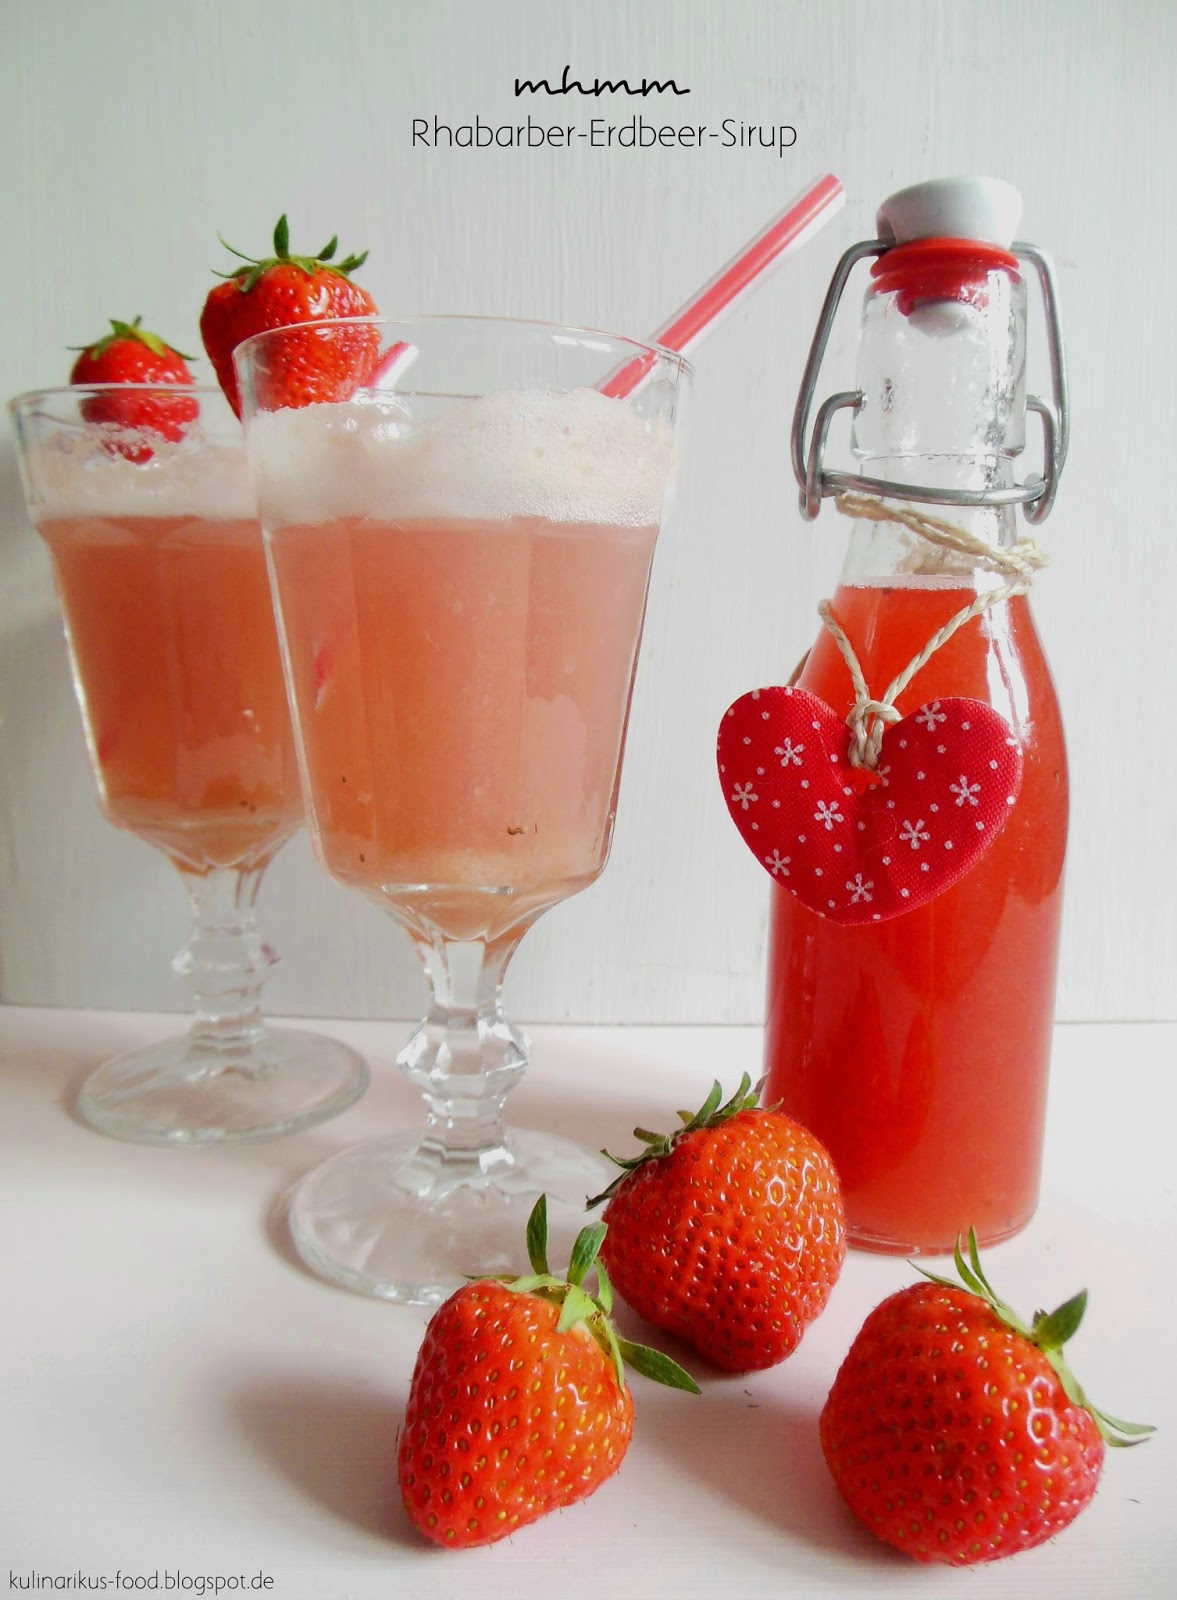 kulinarikus lasst uns den sommer genie en fruchtig frischer rhabarber erdbeer sirup. Black Bedroom Furniture Sets. Home Design Ideas